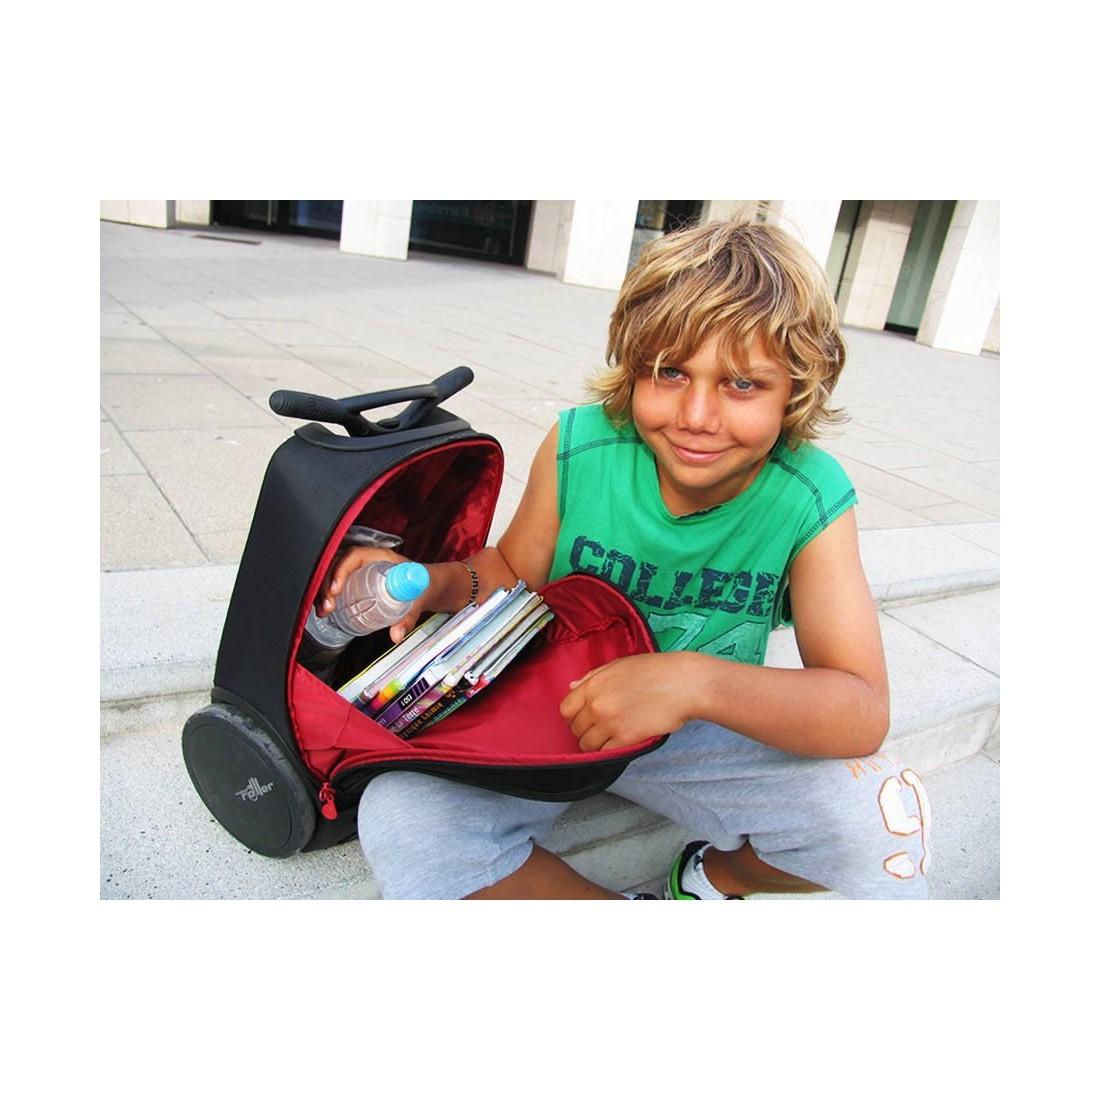 Plecak na kołkach bez szelek Roller XL Ogień dla chłopaka - plecak-tornister.pl